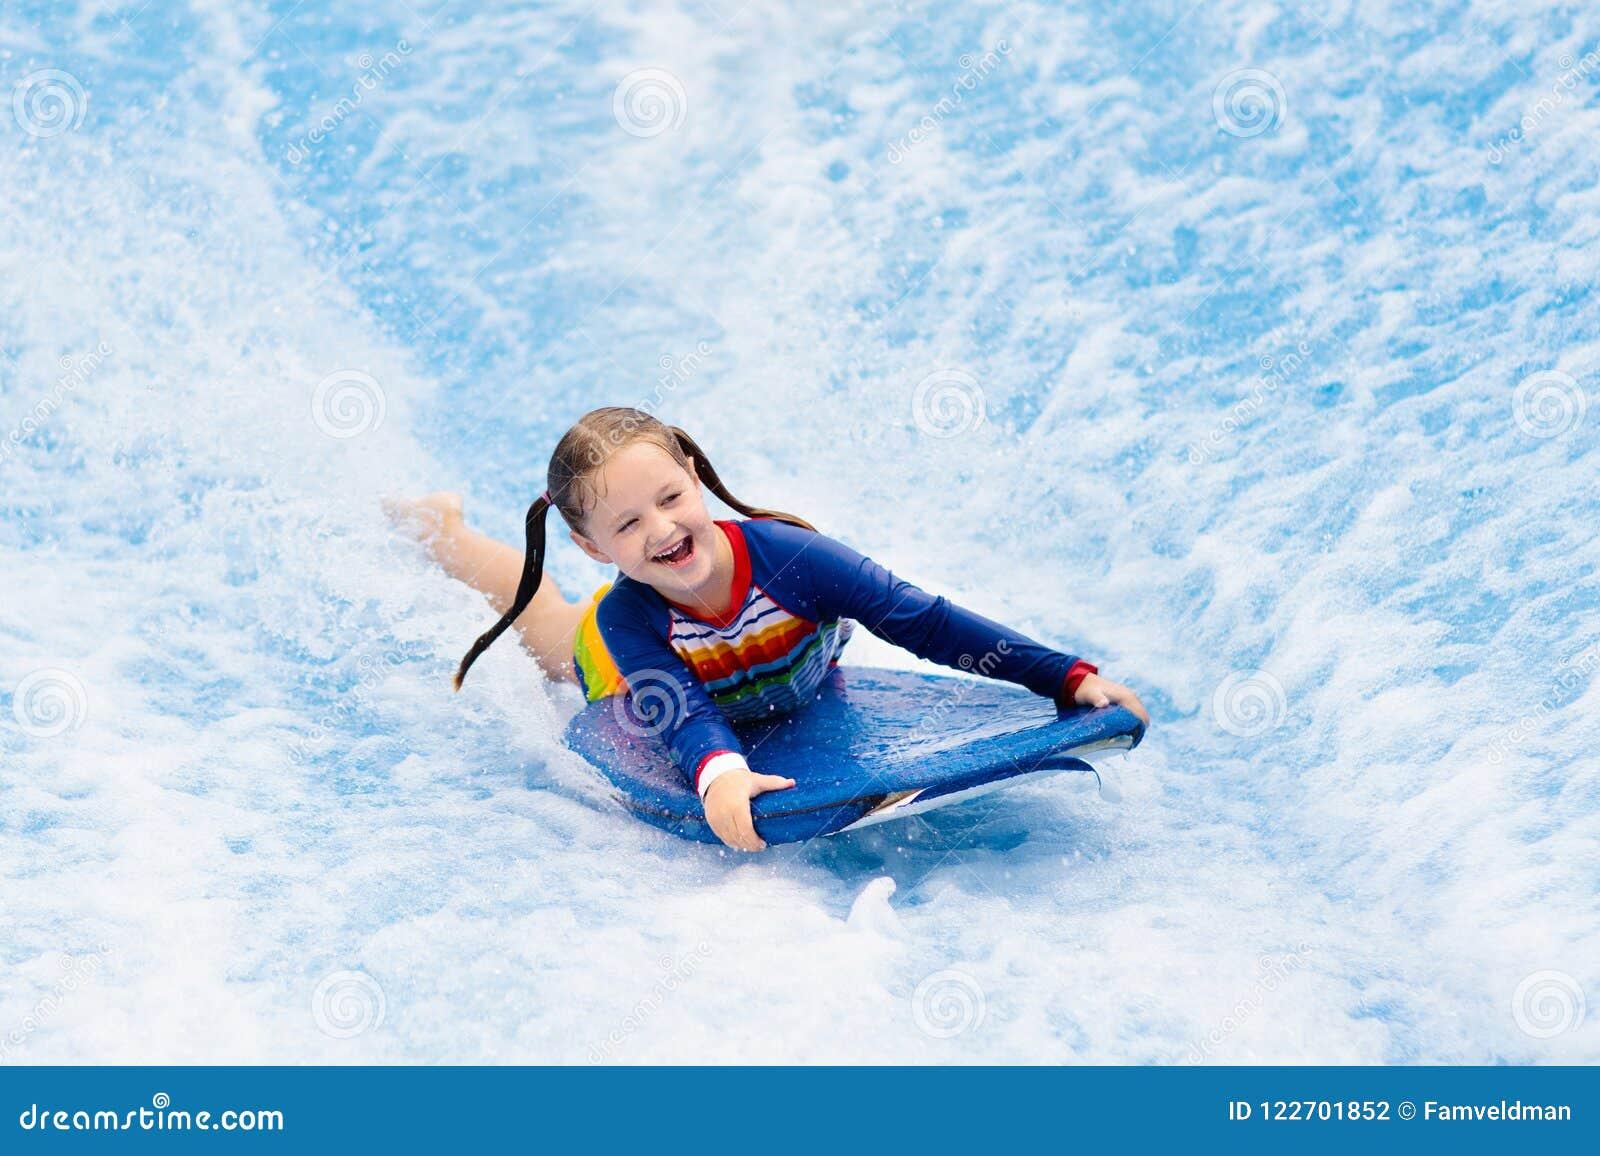 Little girl surfing in beach wave simulator